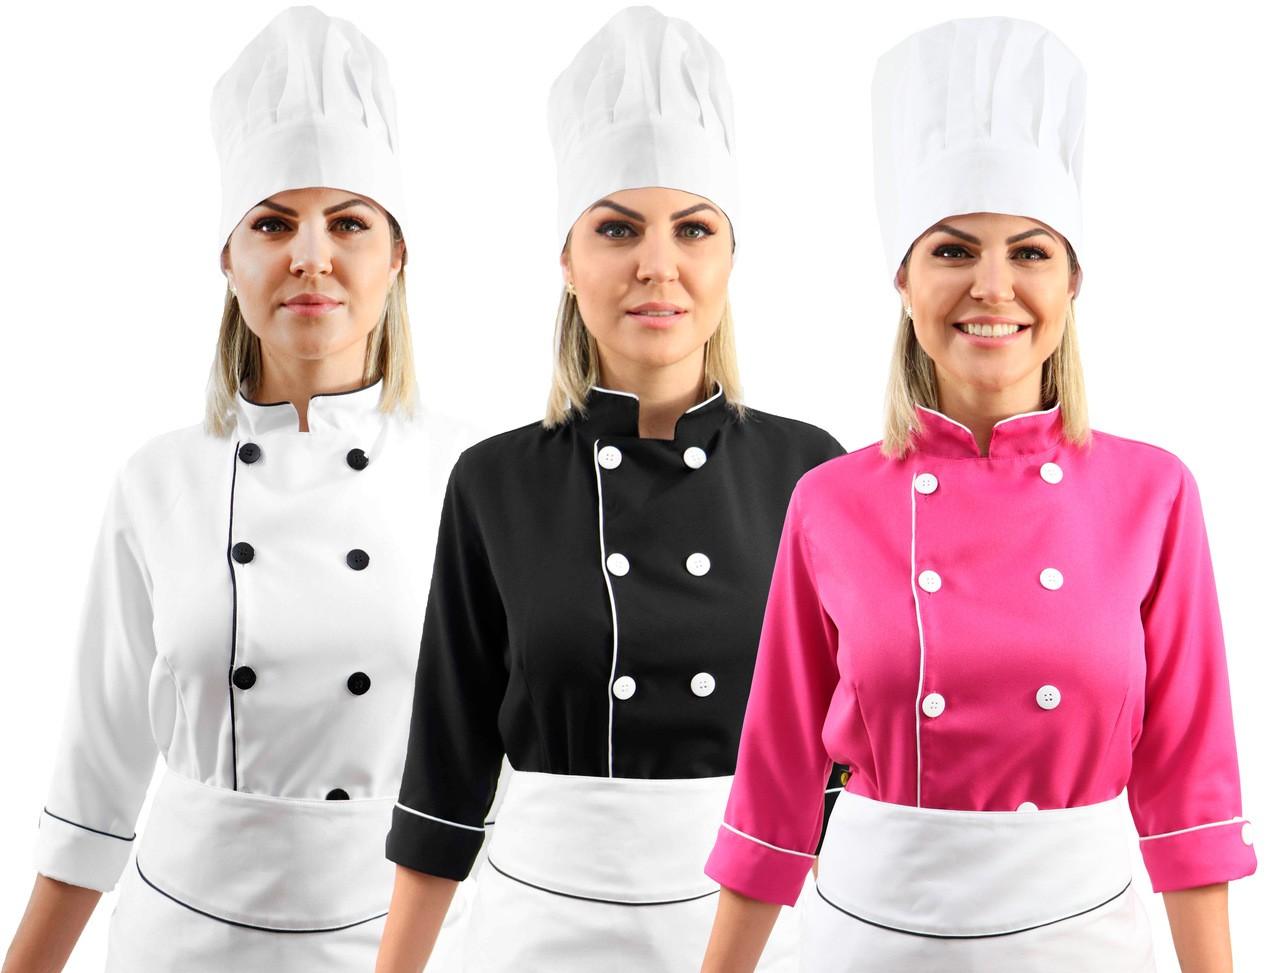 Kit Chef Cozinha Feminino Dolmã Manga 3/4 + Avental branco + Chapéu branco